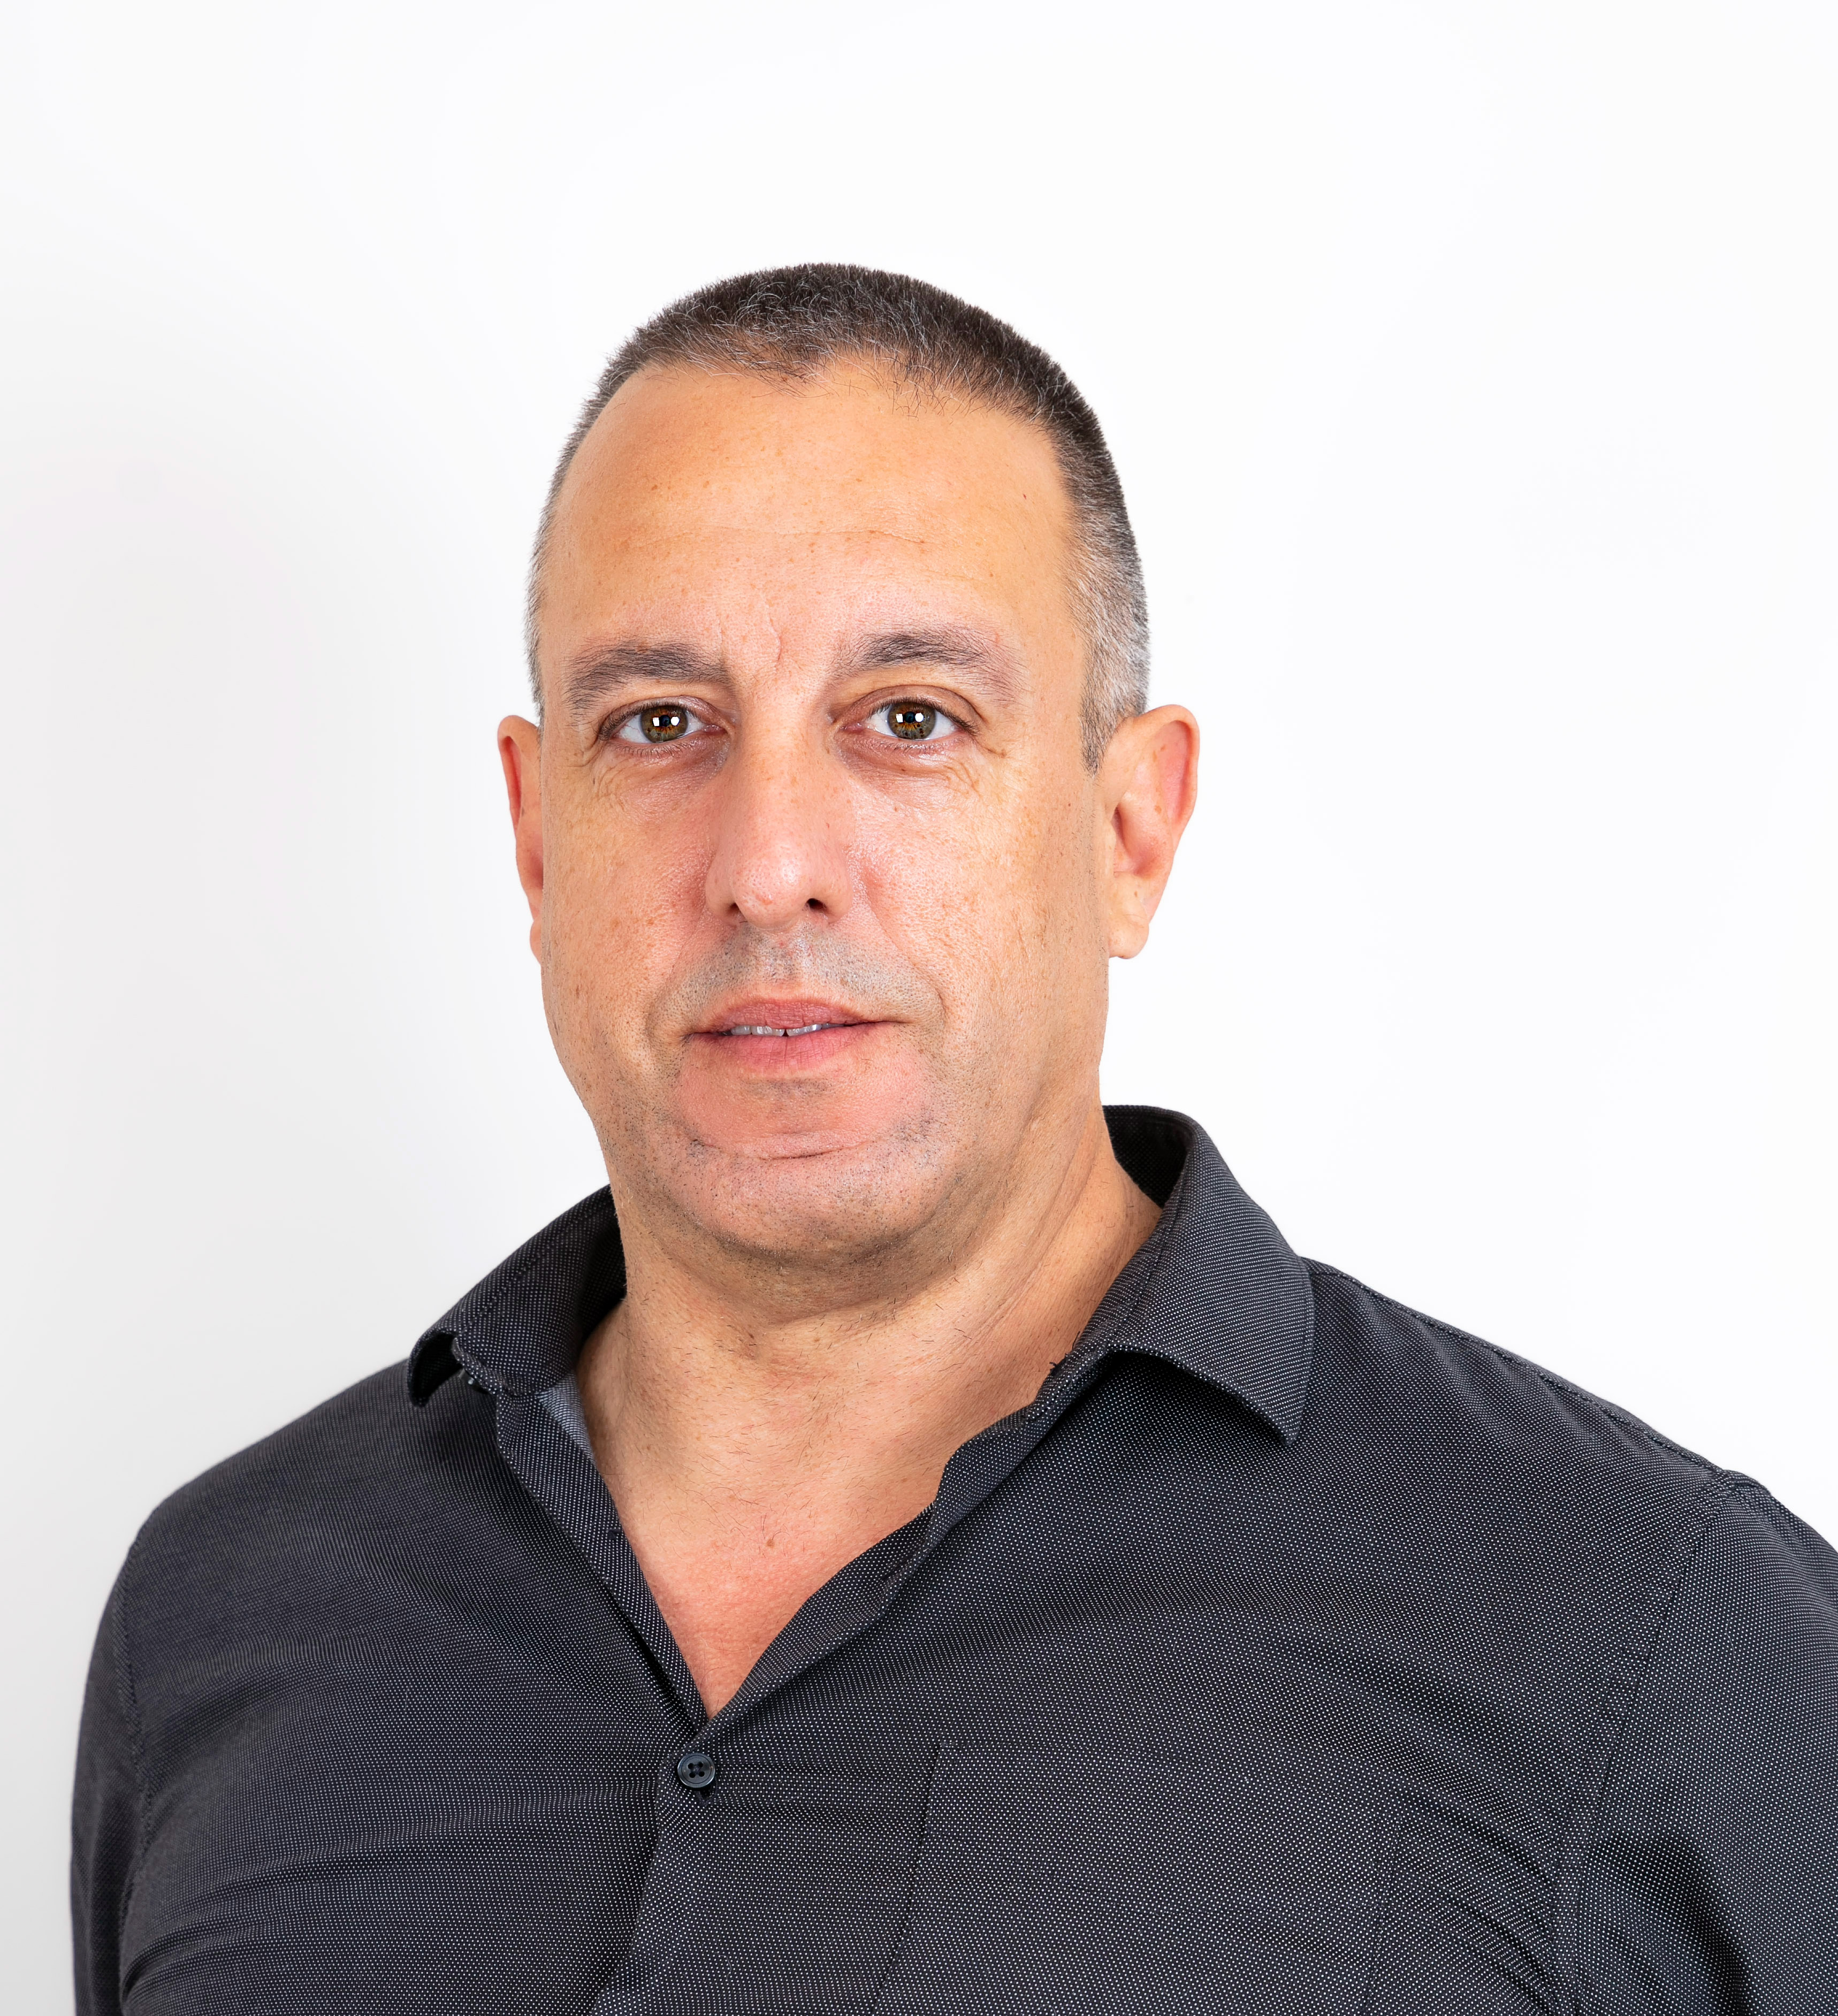 Miguel Sousa